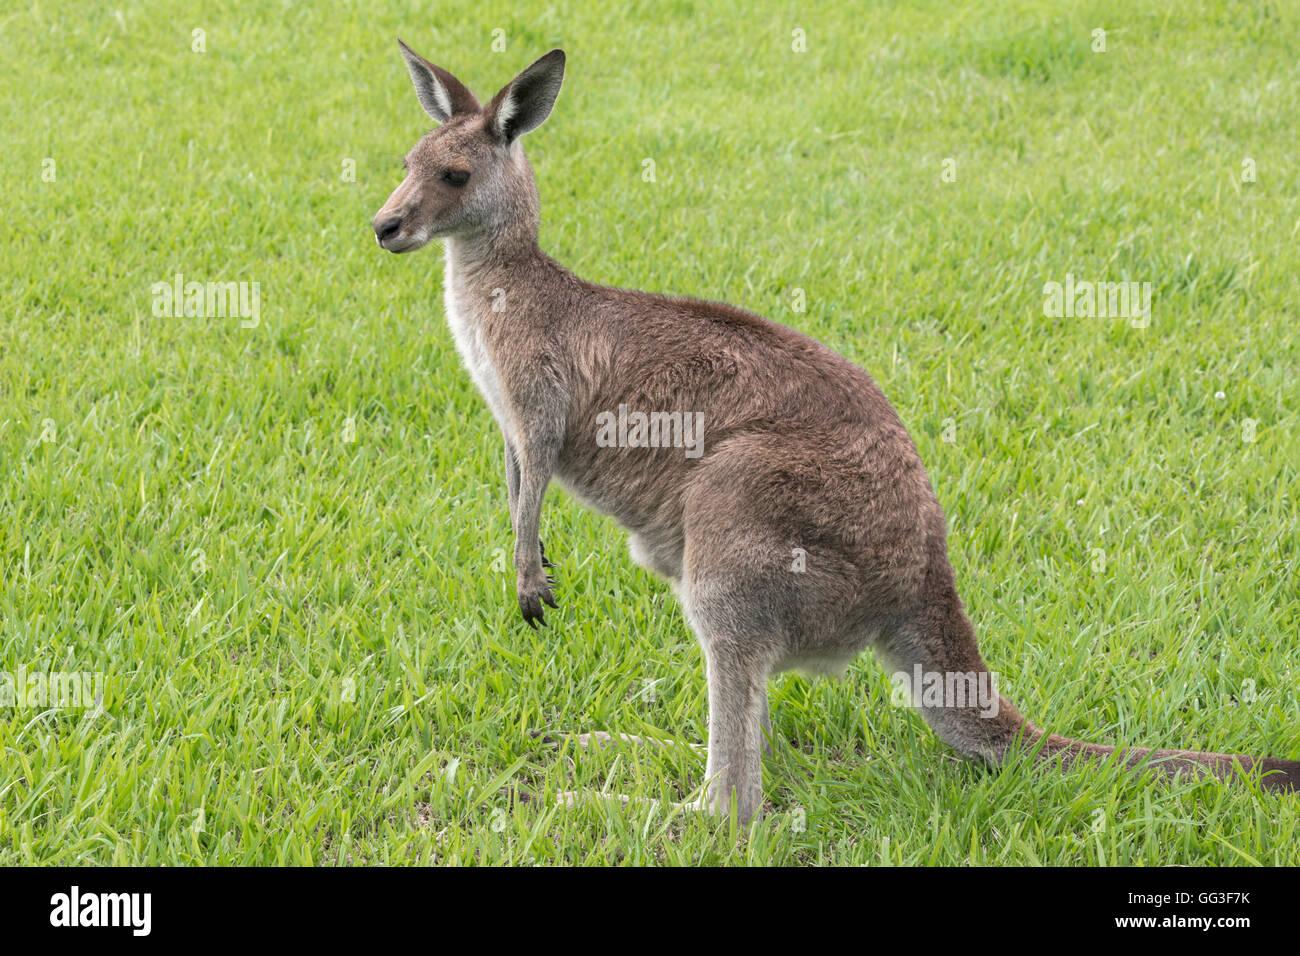 Eastern Grey kangaroo, Macropus giganteus, photographed in a semi-urban setting, southern Queensland, Australia. - Stock Image